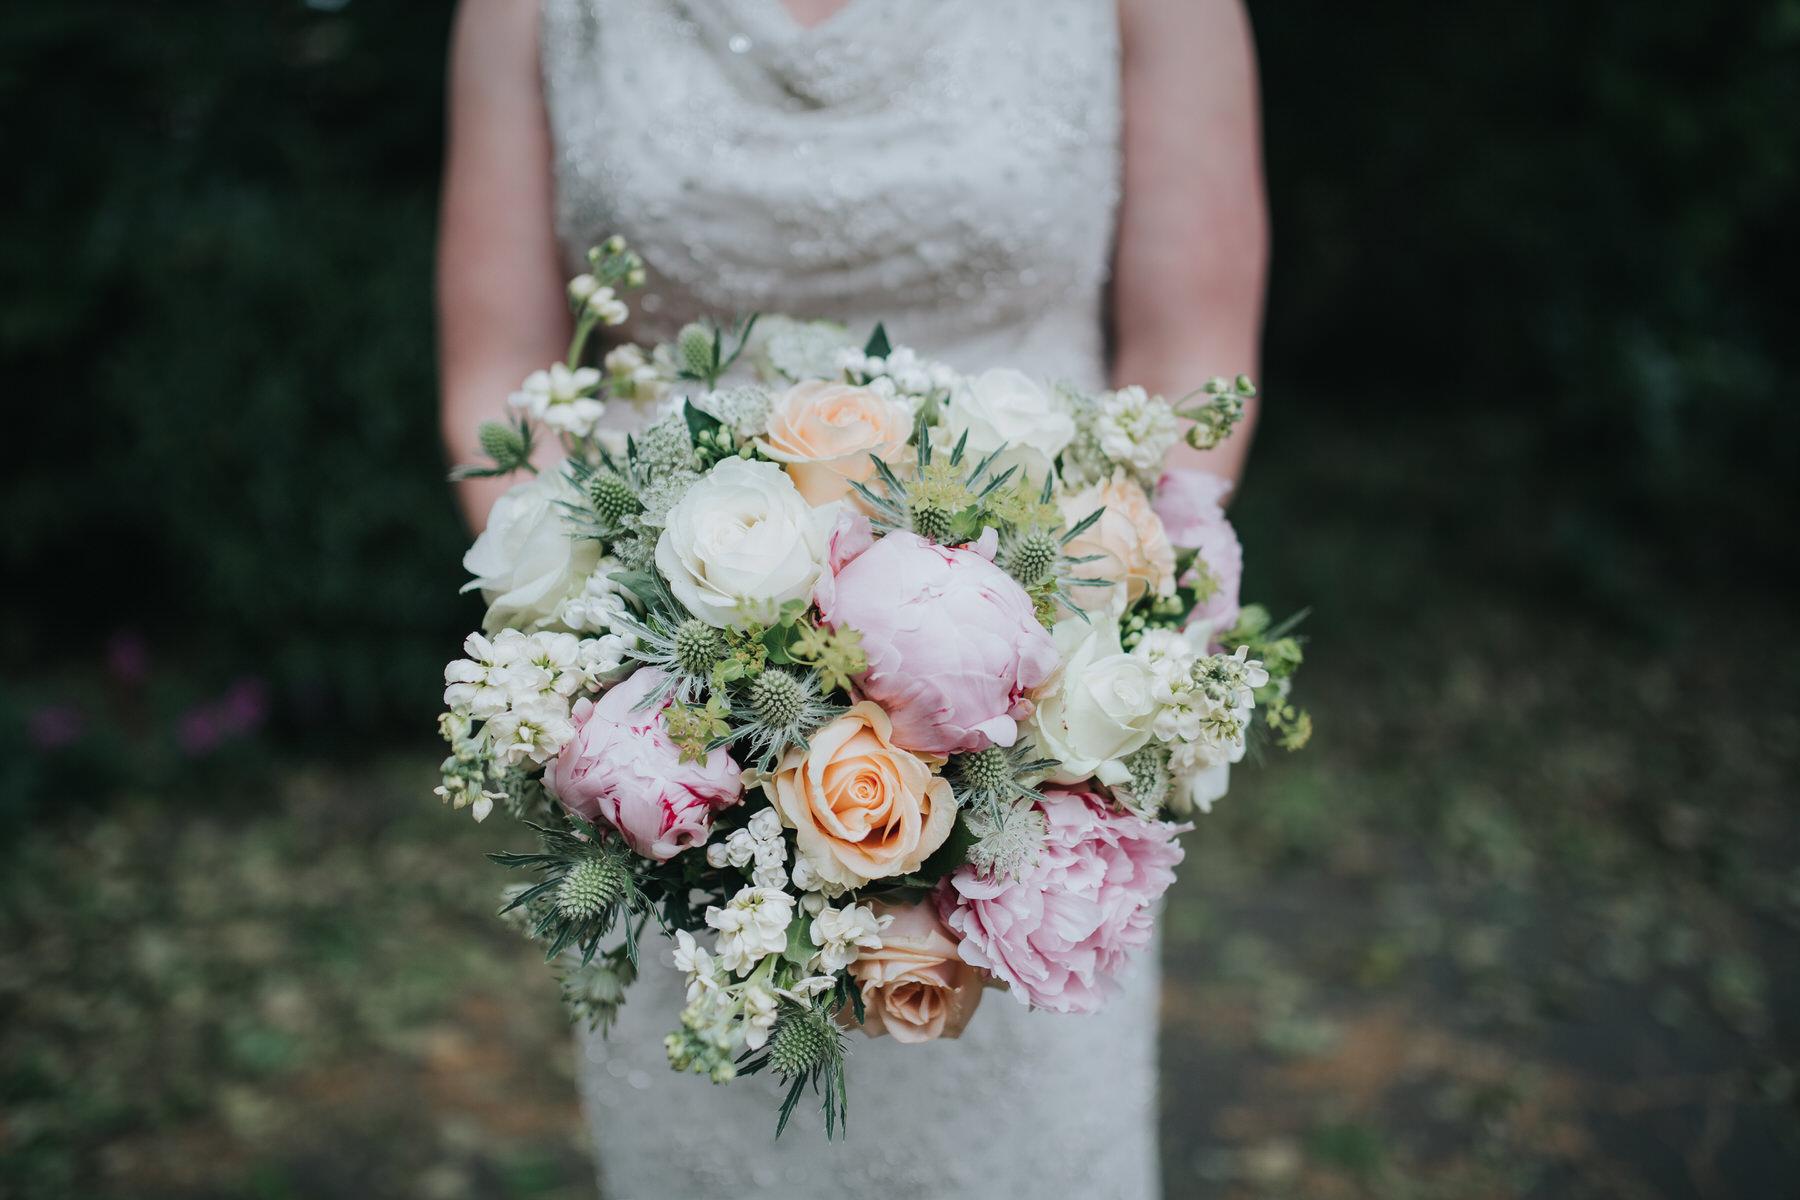 171 bride hoding bouquet thistle blush peony white rose.jpg